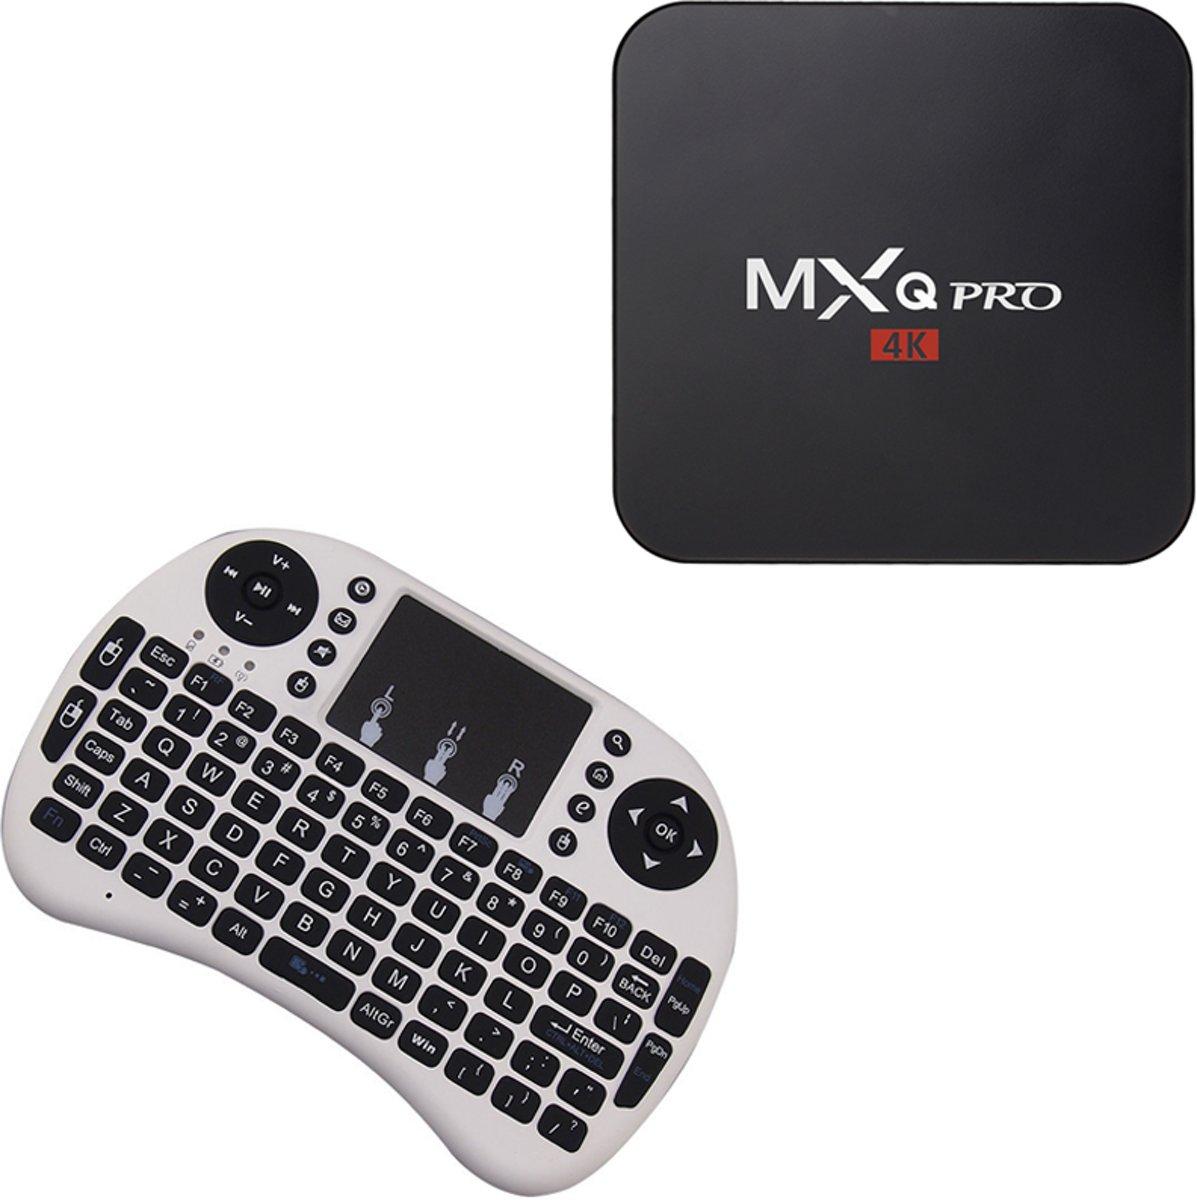 MXQ PRO 4K Android TV Box s905 Kodi 16.1 Android 5.1 - 1GB 8GB + GRATIS Rii i8 WIT WIRELESS KEYBOARD AIRMOUSE